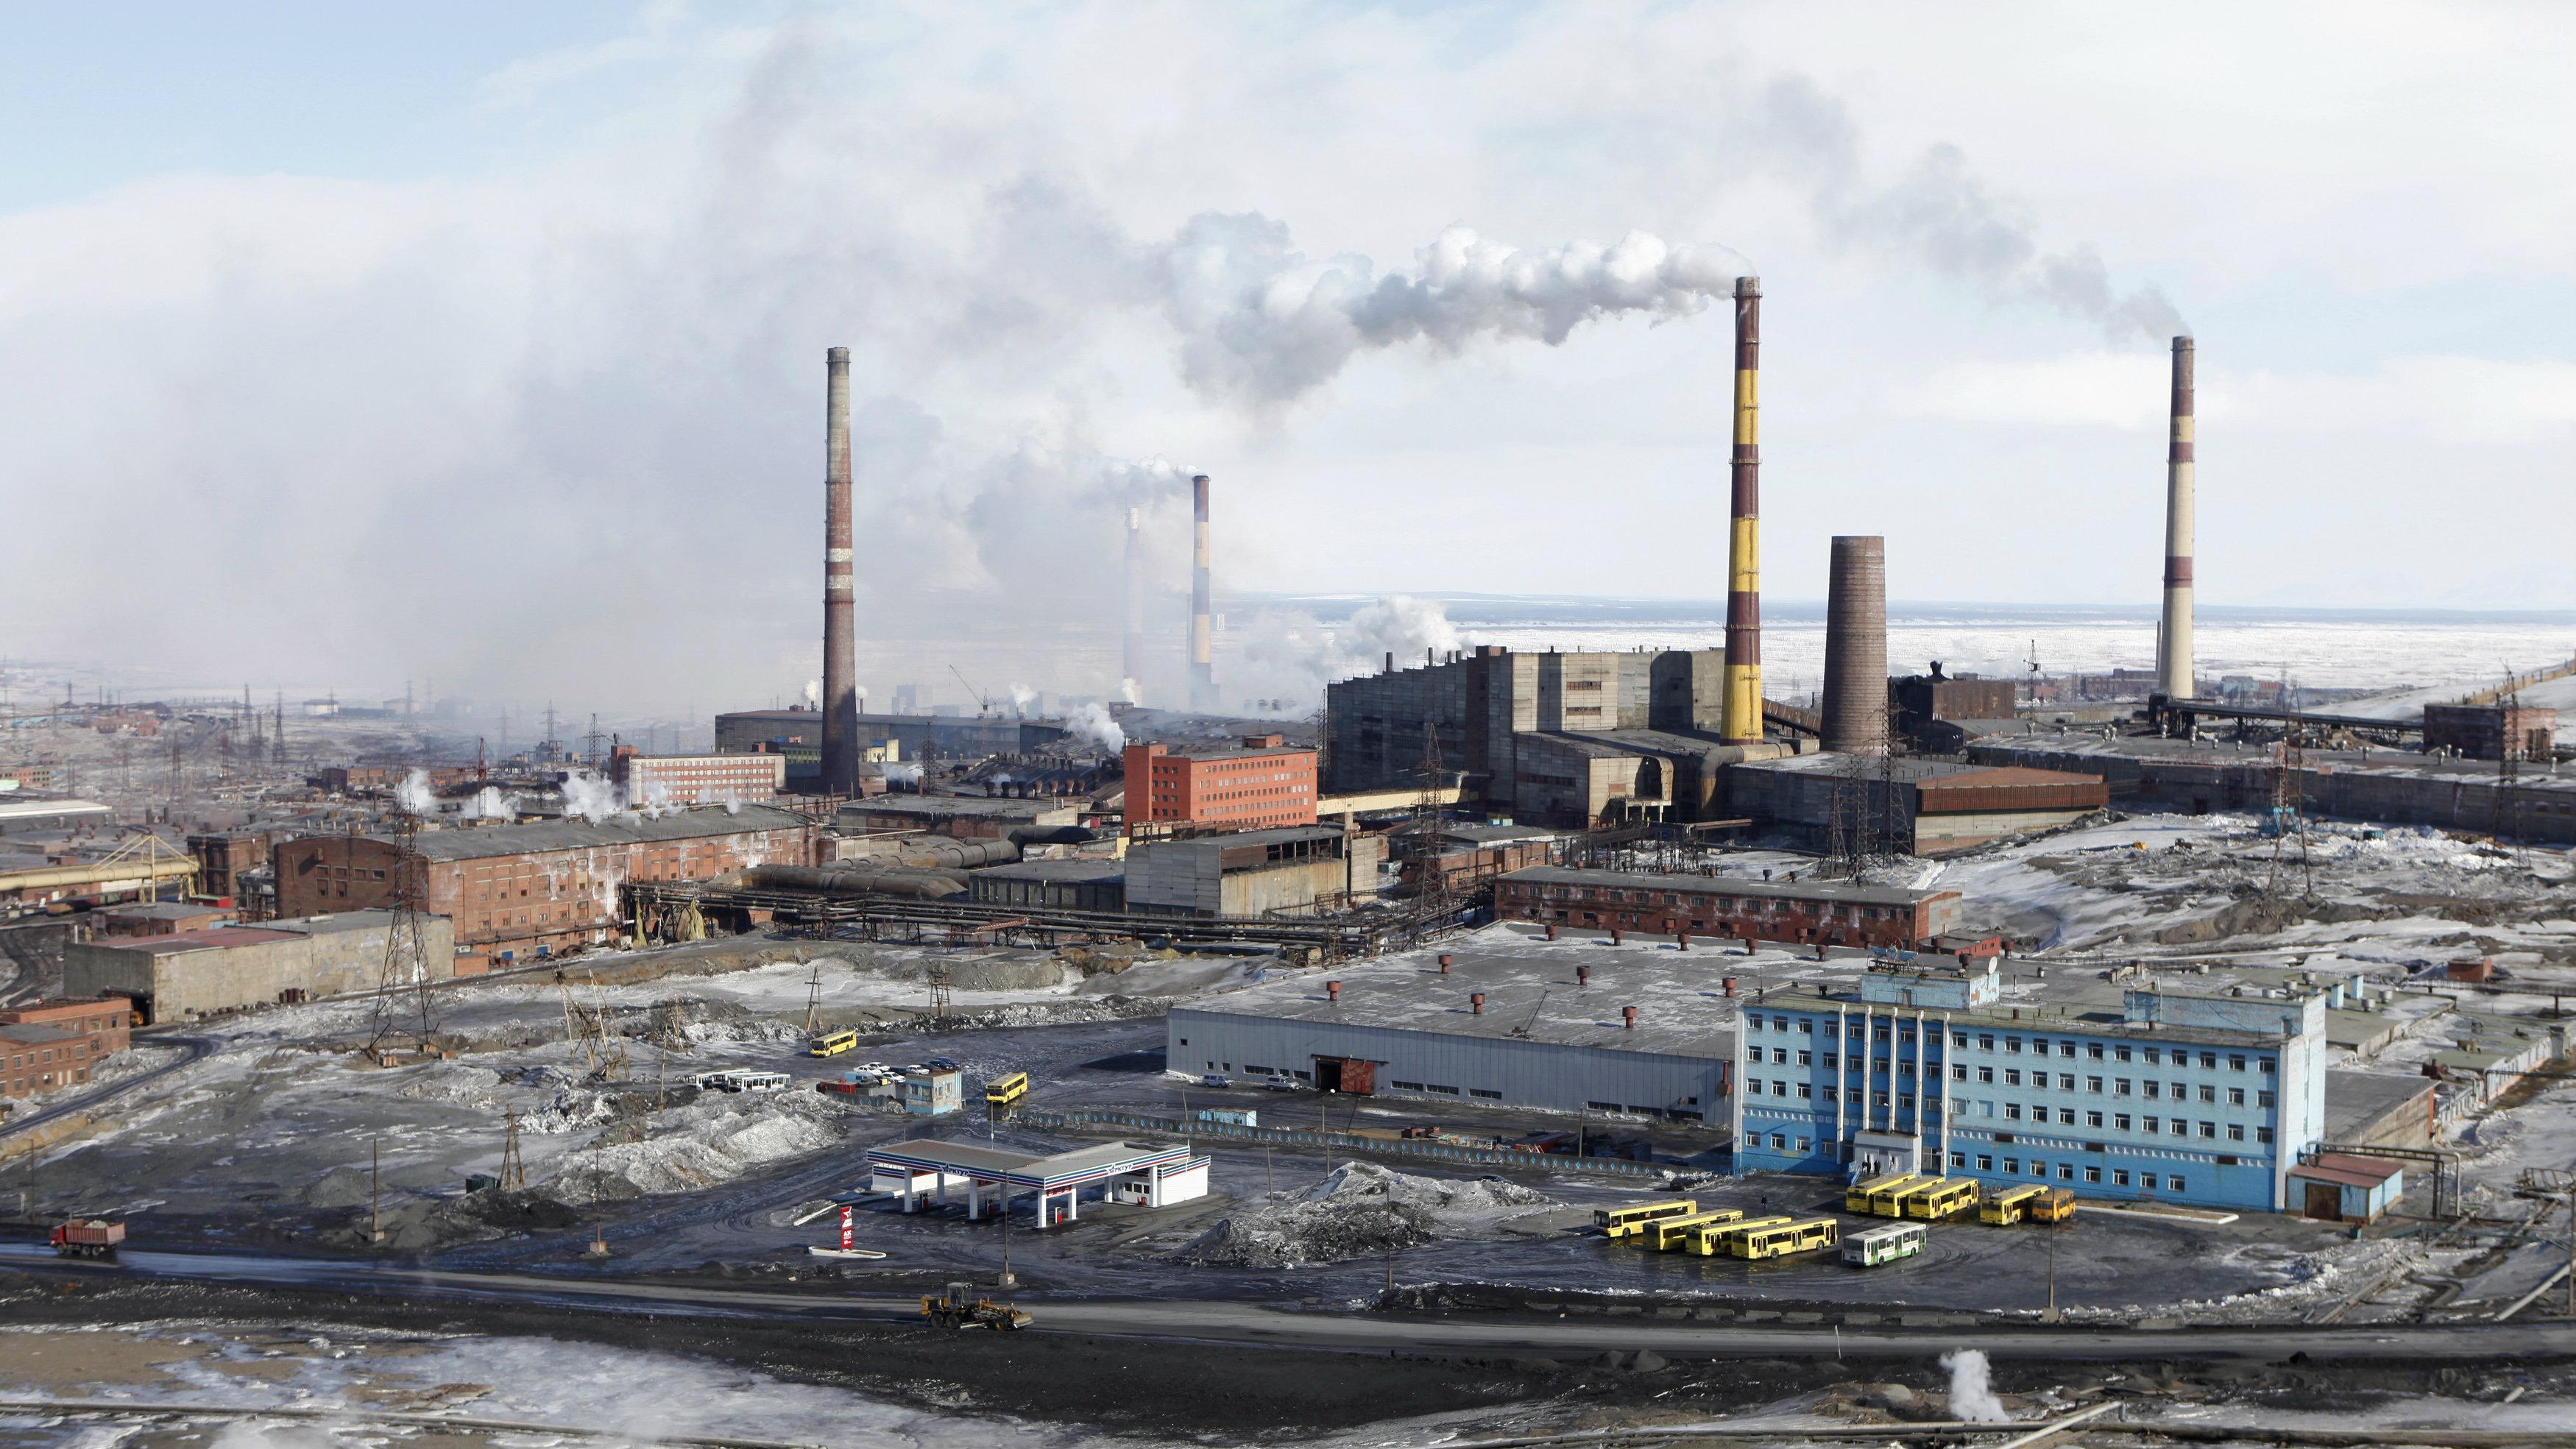 Norilsk Nickel's nickel plant in the Russia